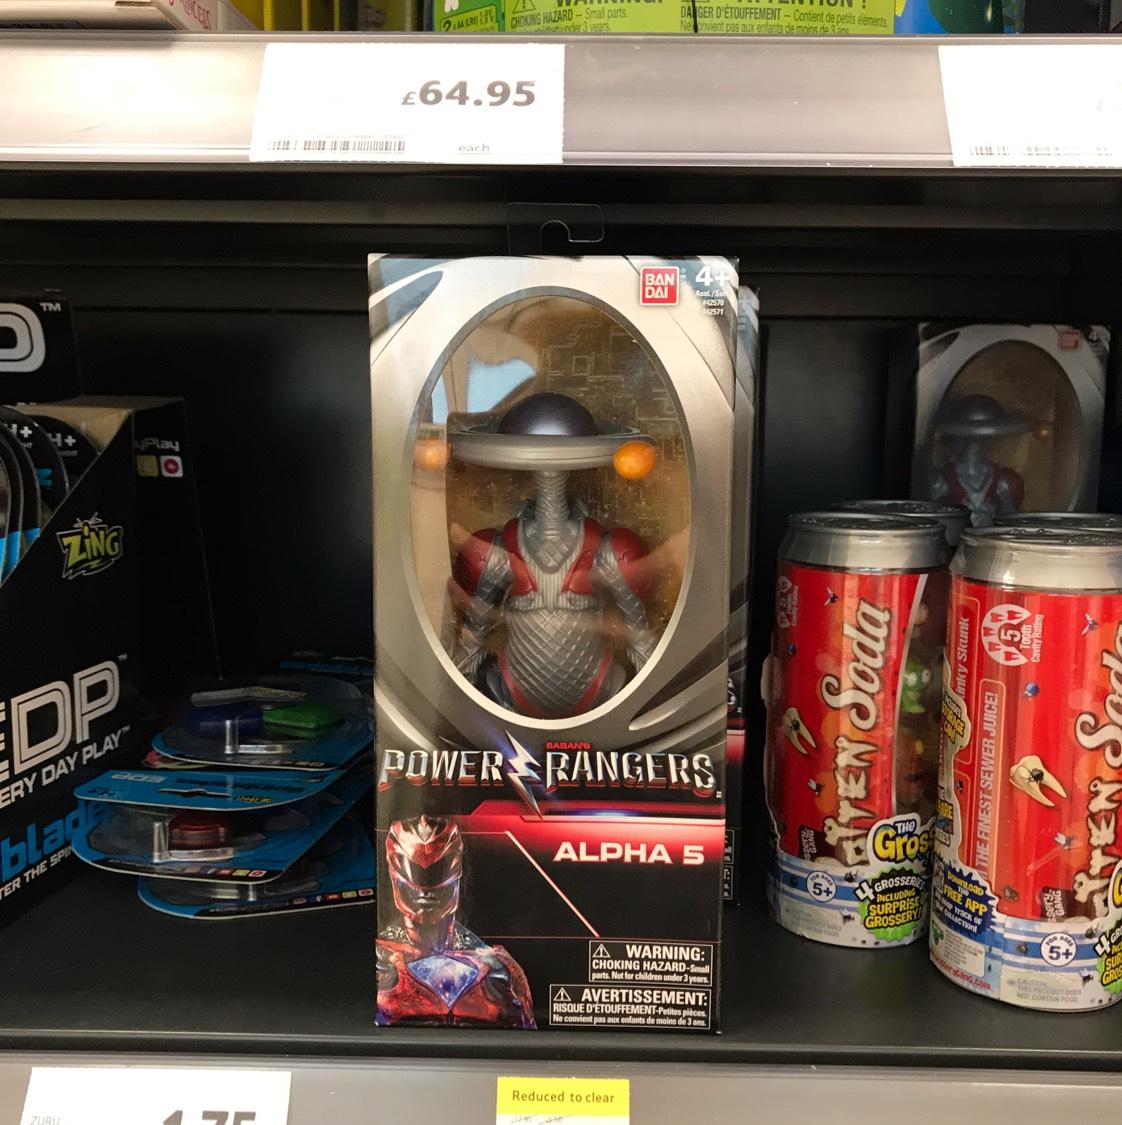 Power Rangers Alpha 5 Figure instore at Tesco for £3.24